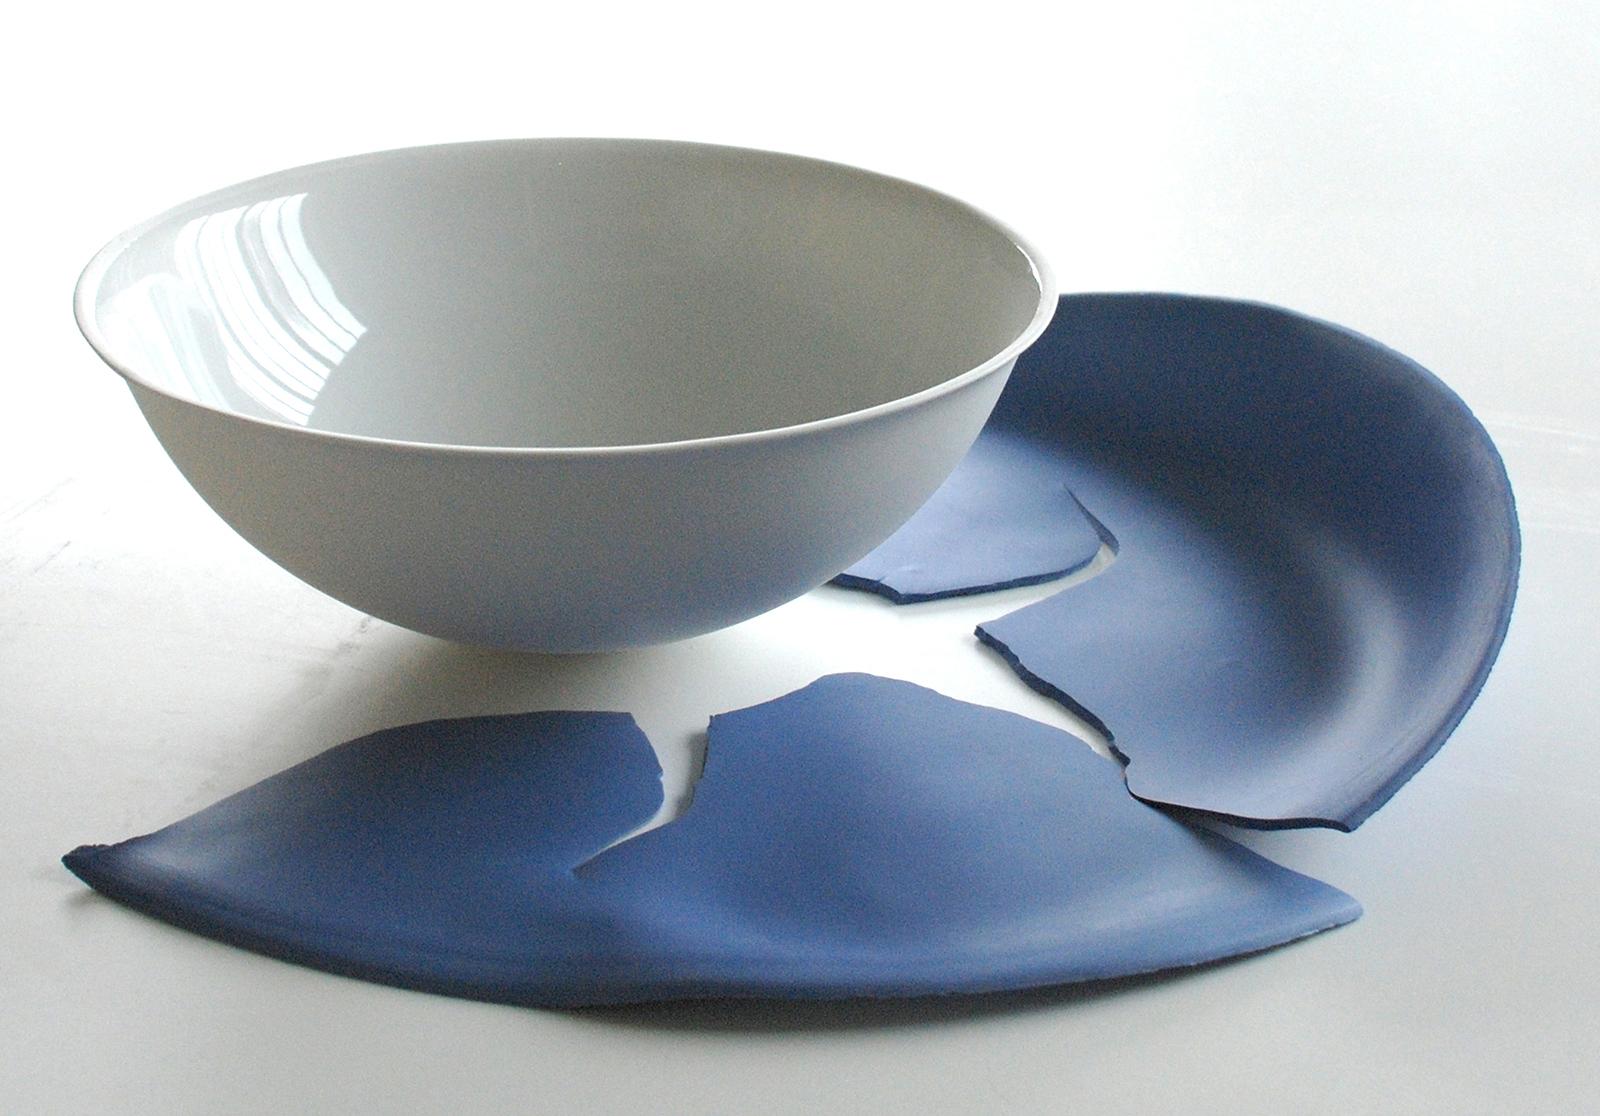 'Shadow' 2016 60 x 57 x 12 cm Porcelain